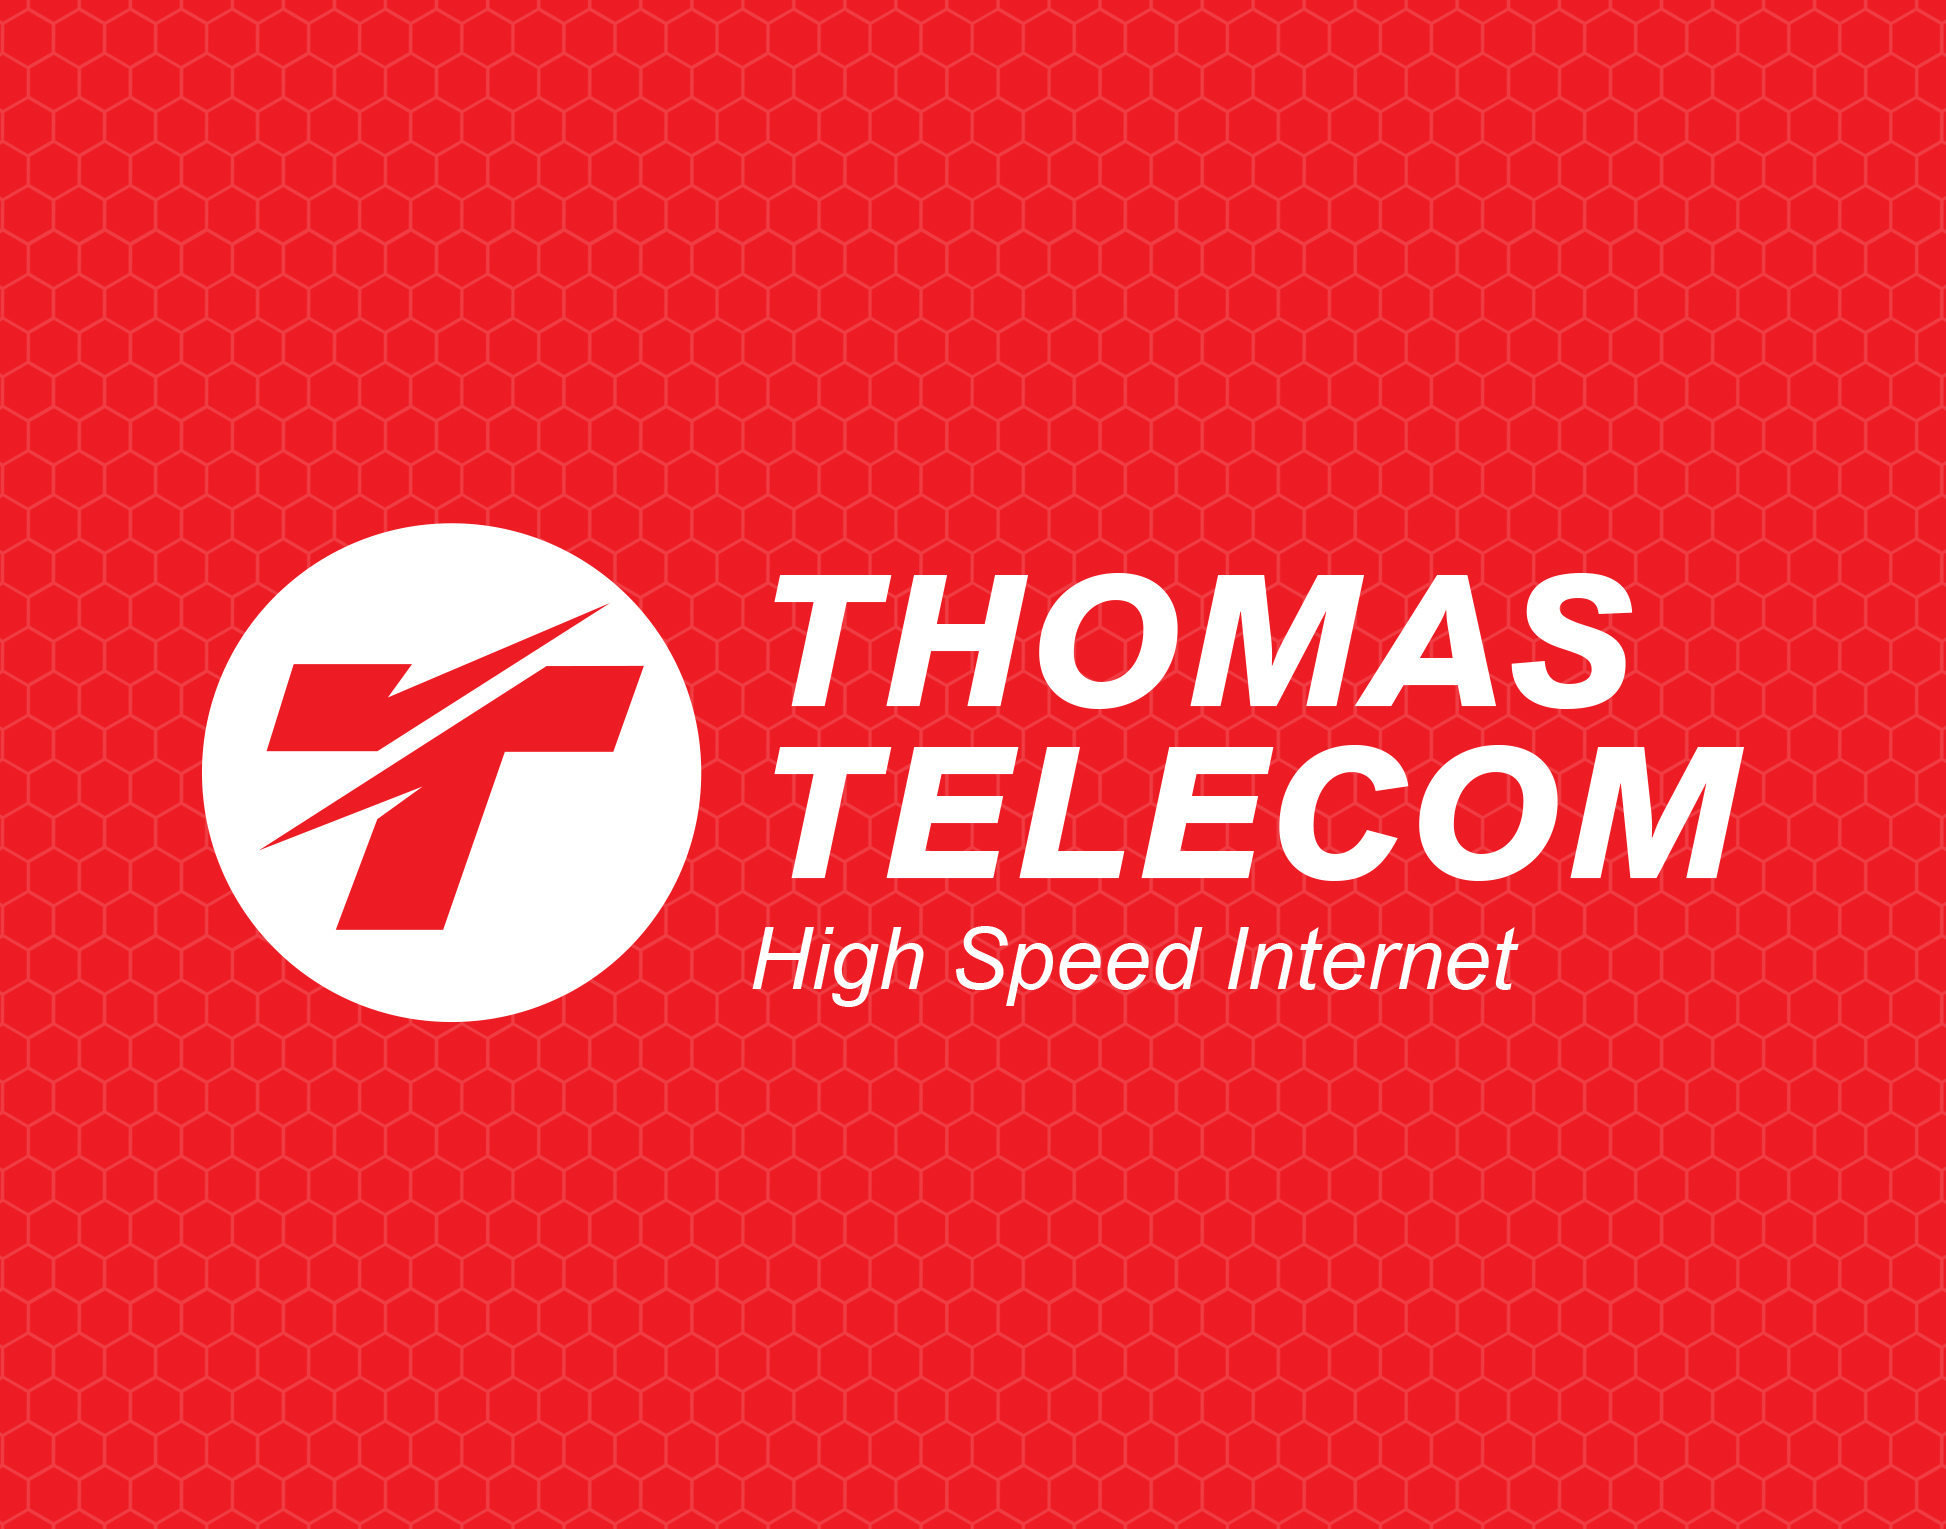 Thomas Telecom